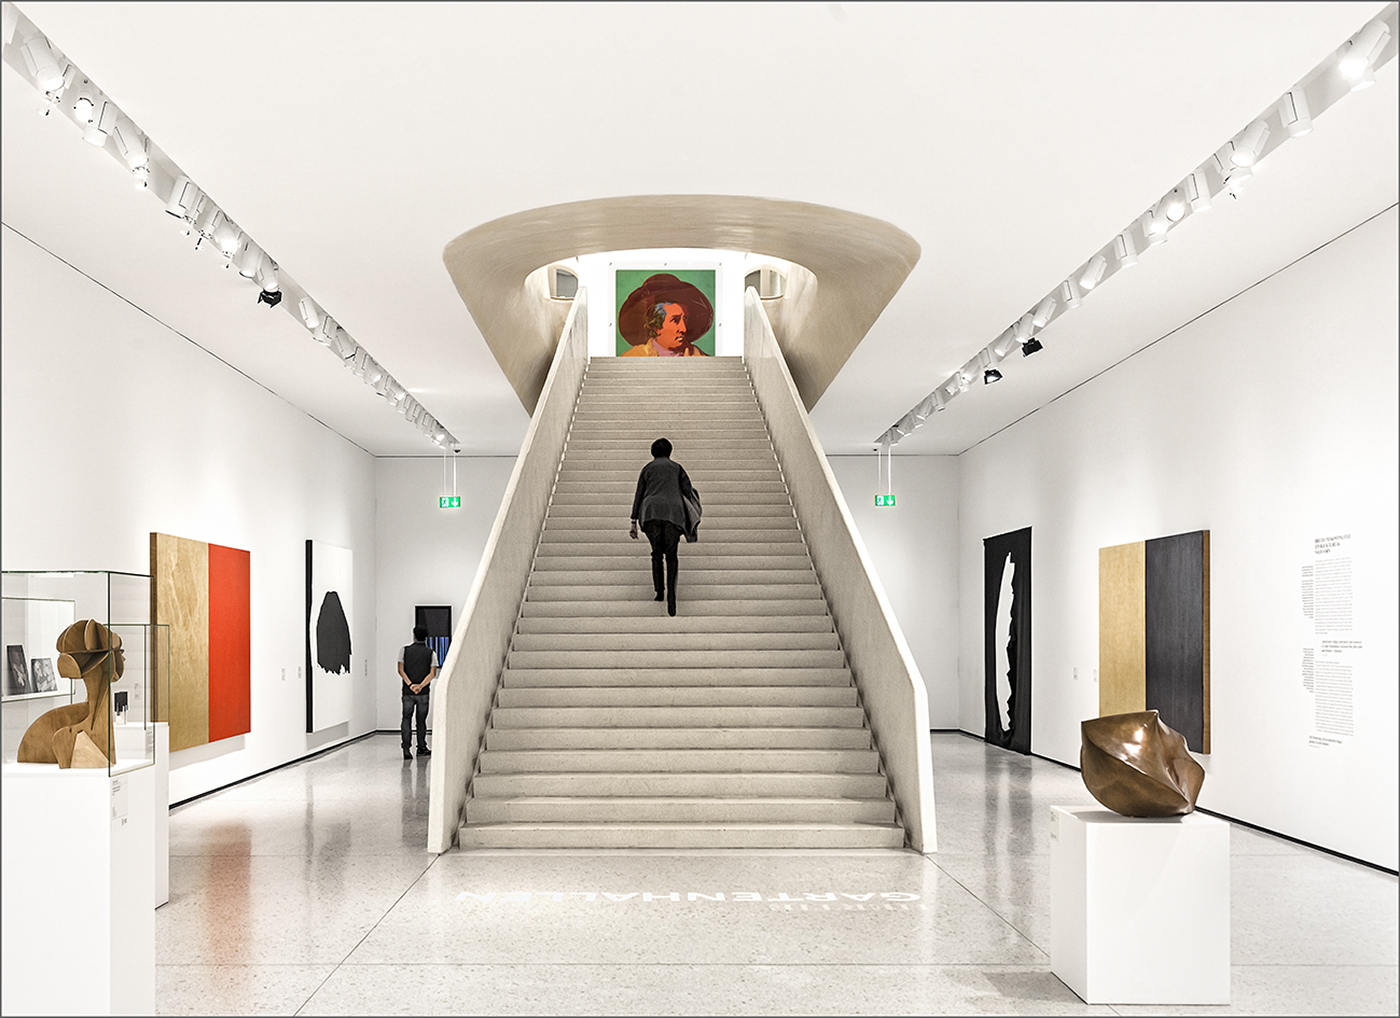 Städel Museum, Germany